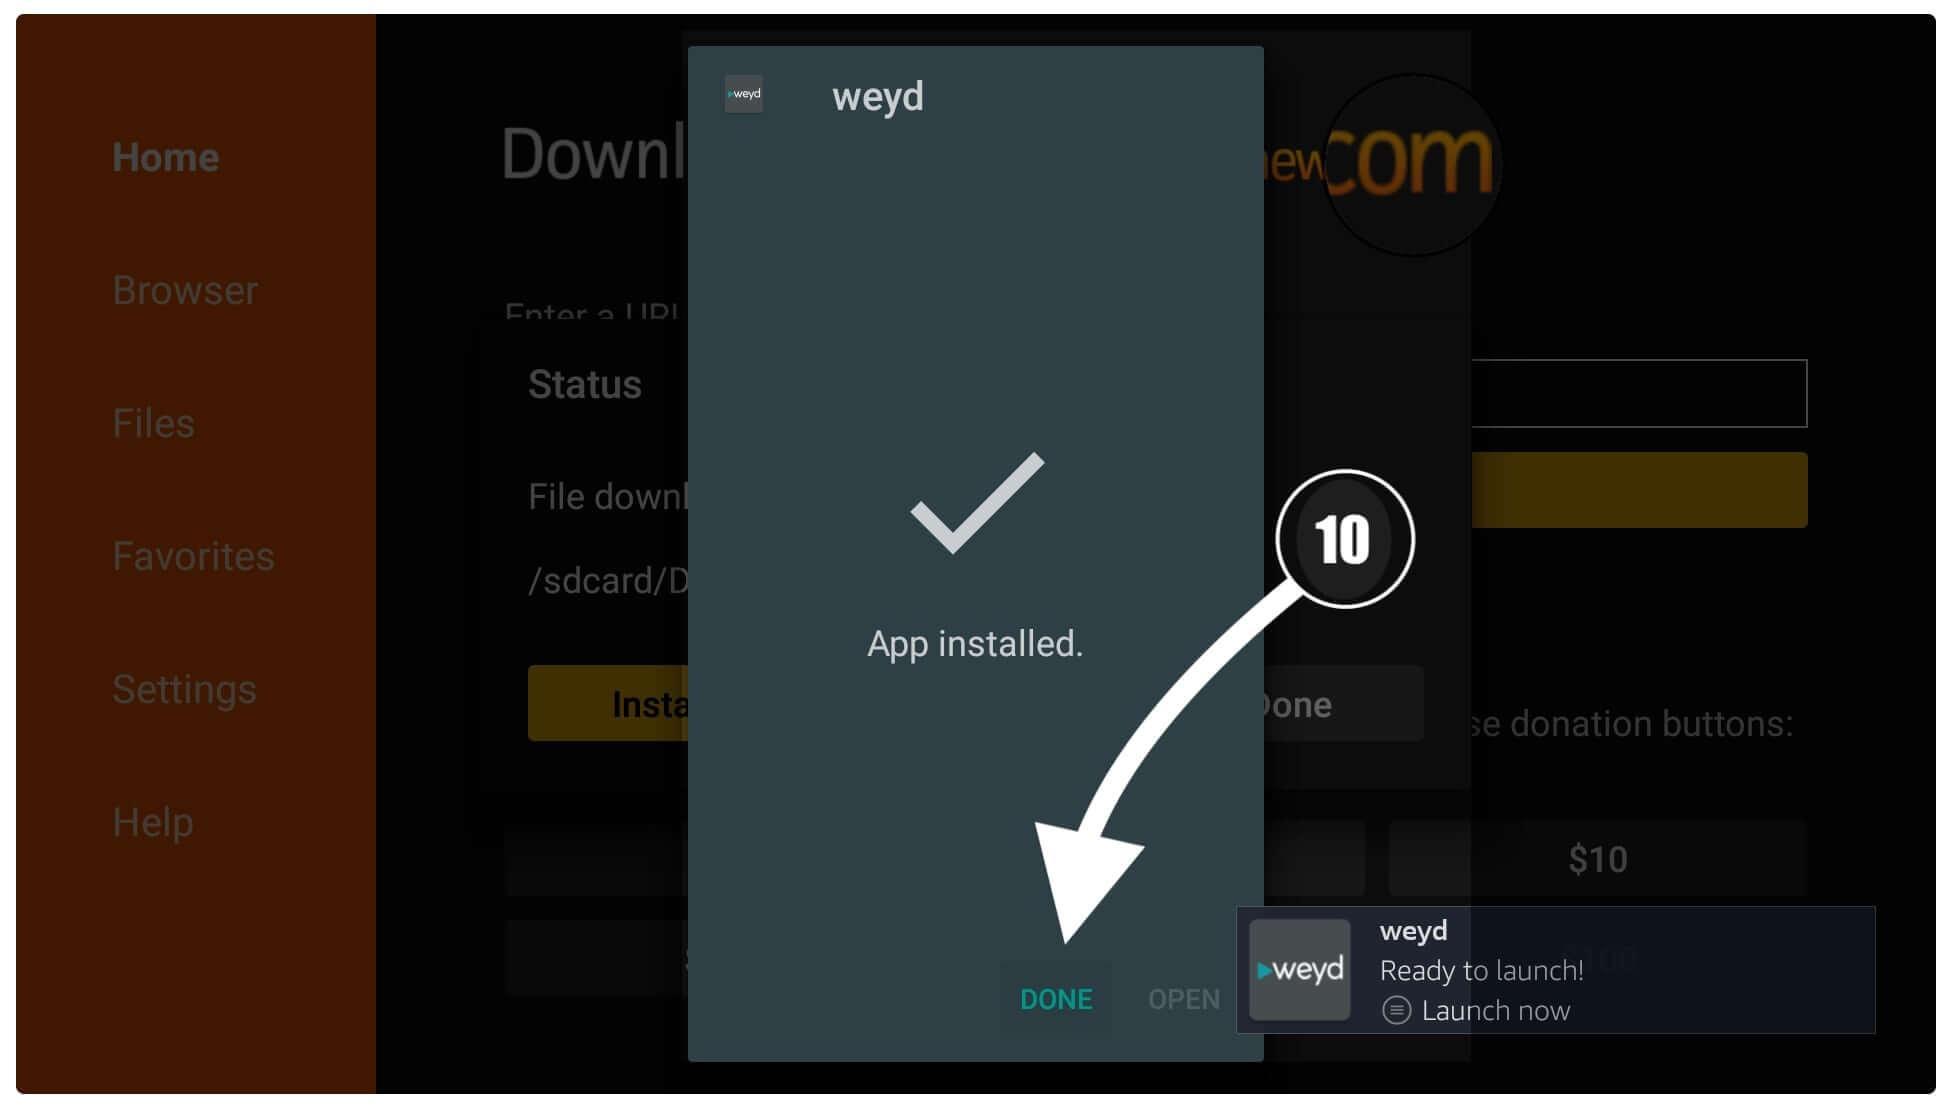 Download-Weyd-APK-on-Firestick